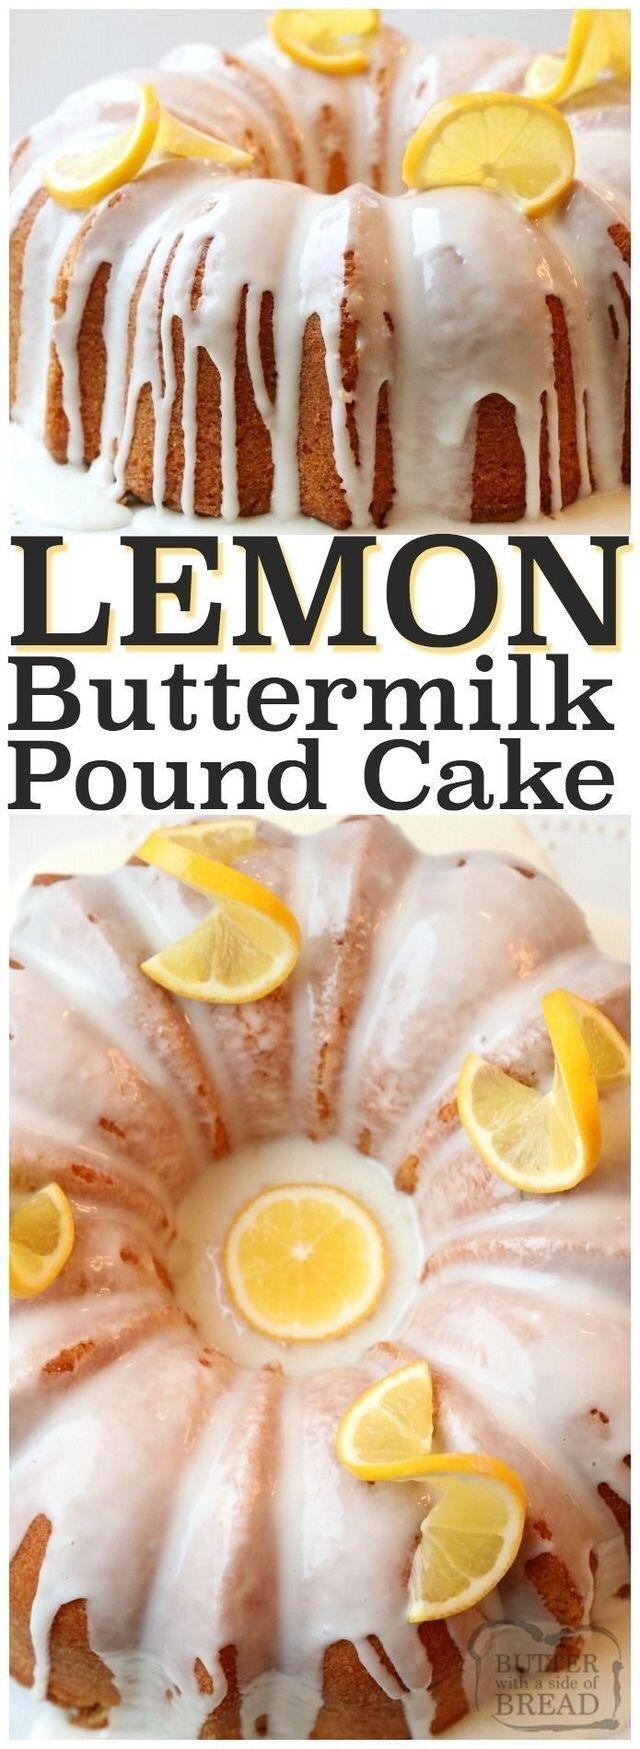 39 Perfect Pound Cake Recipes Our Best Life Lemon Buttermilk Pound Cake Classic Pound Cake Recipe Buttermilk Recipes